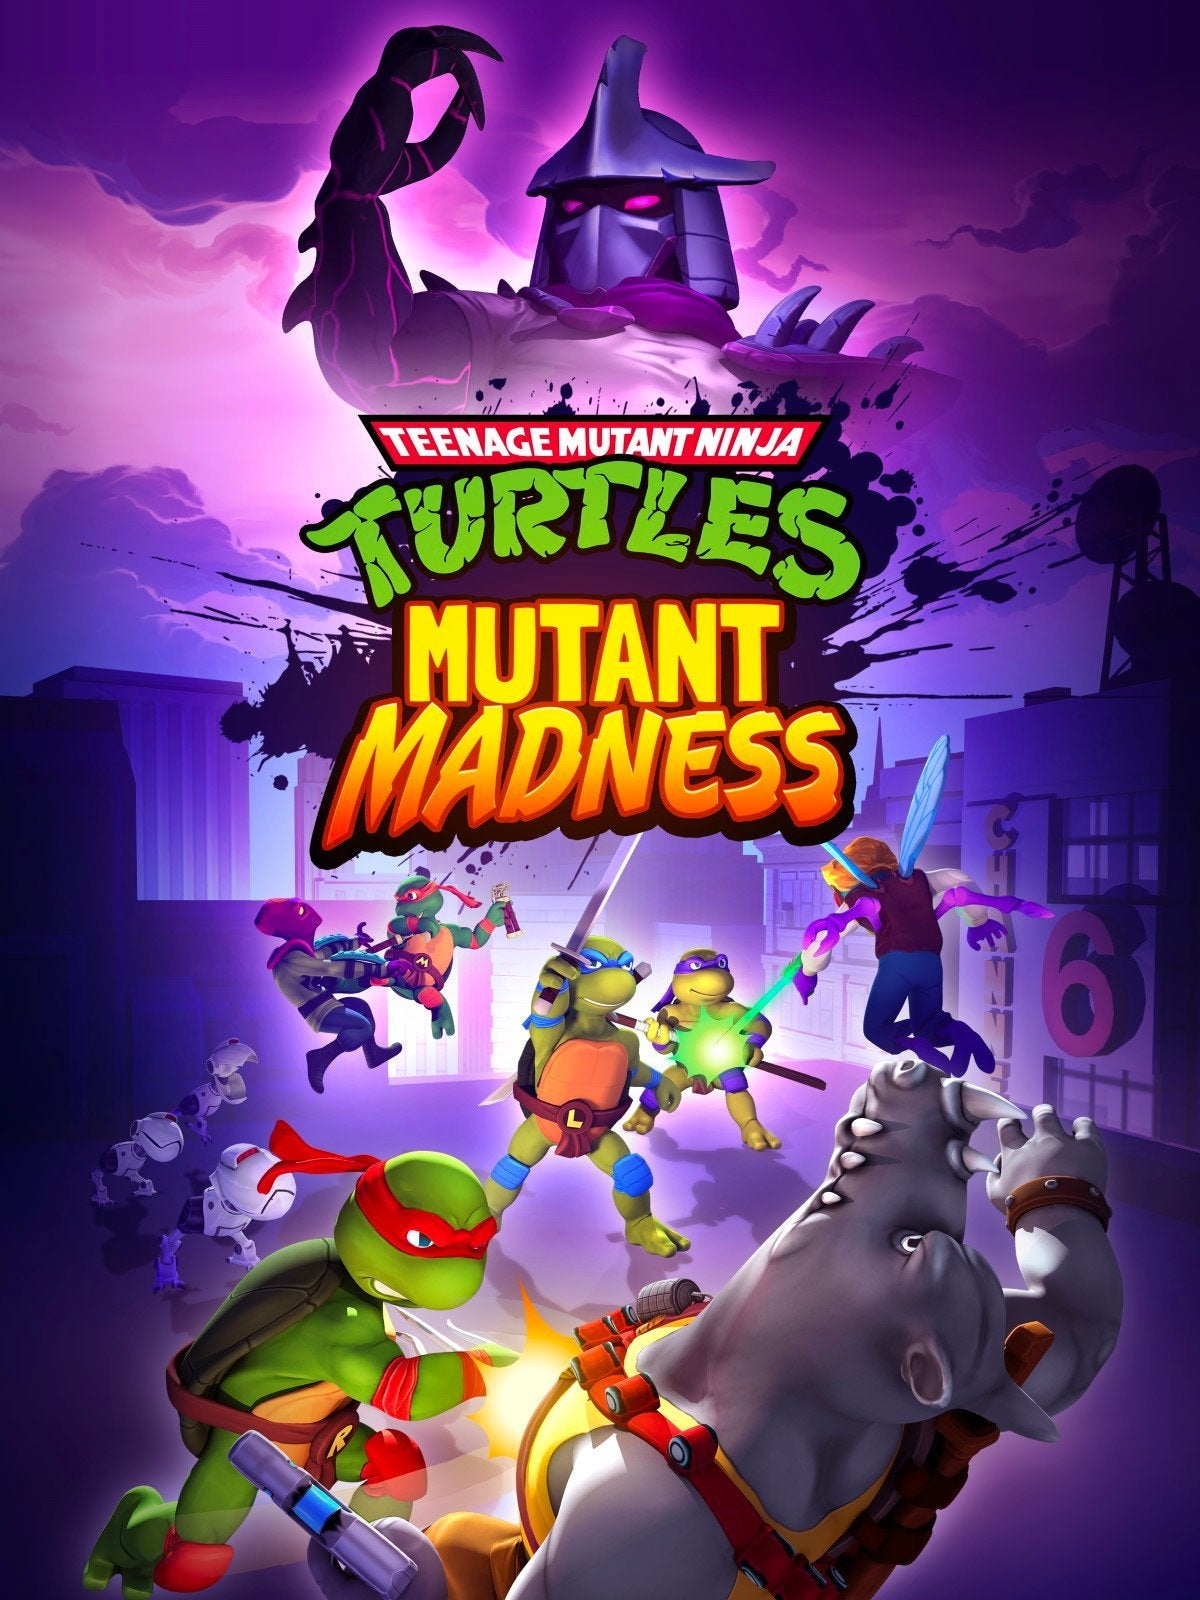 Las Tortugas Ninja tendrán nuevo videojuego: Mutant Madness 2